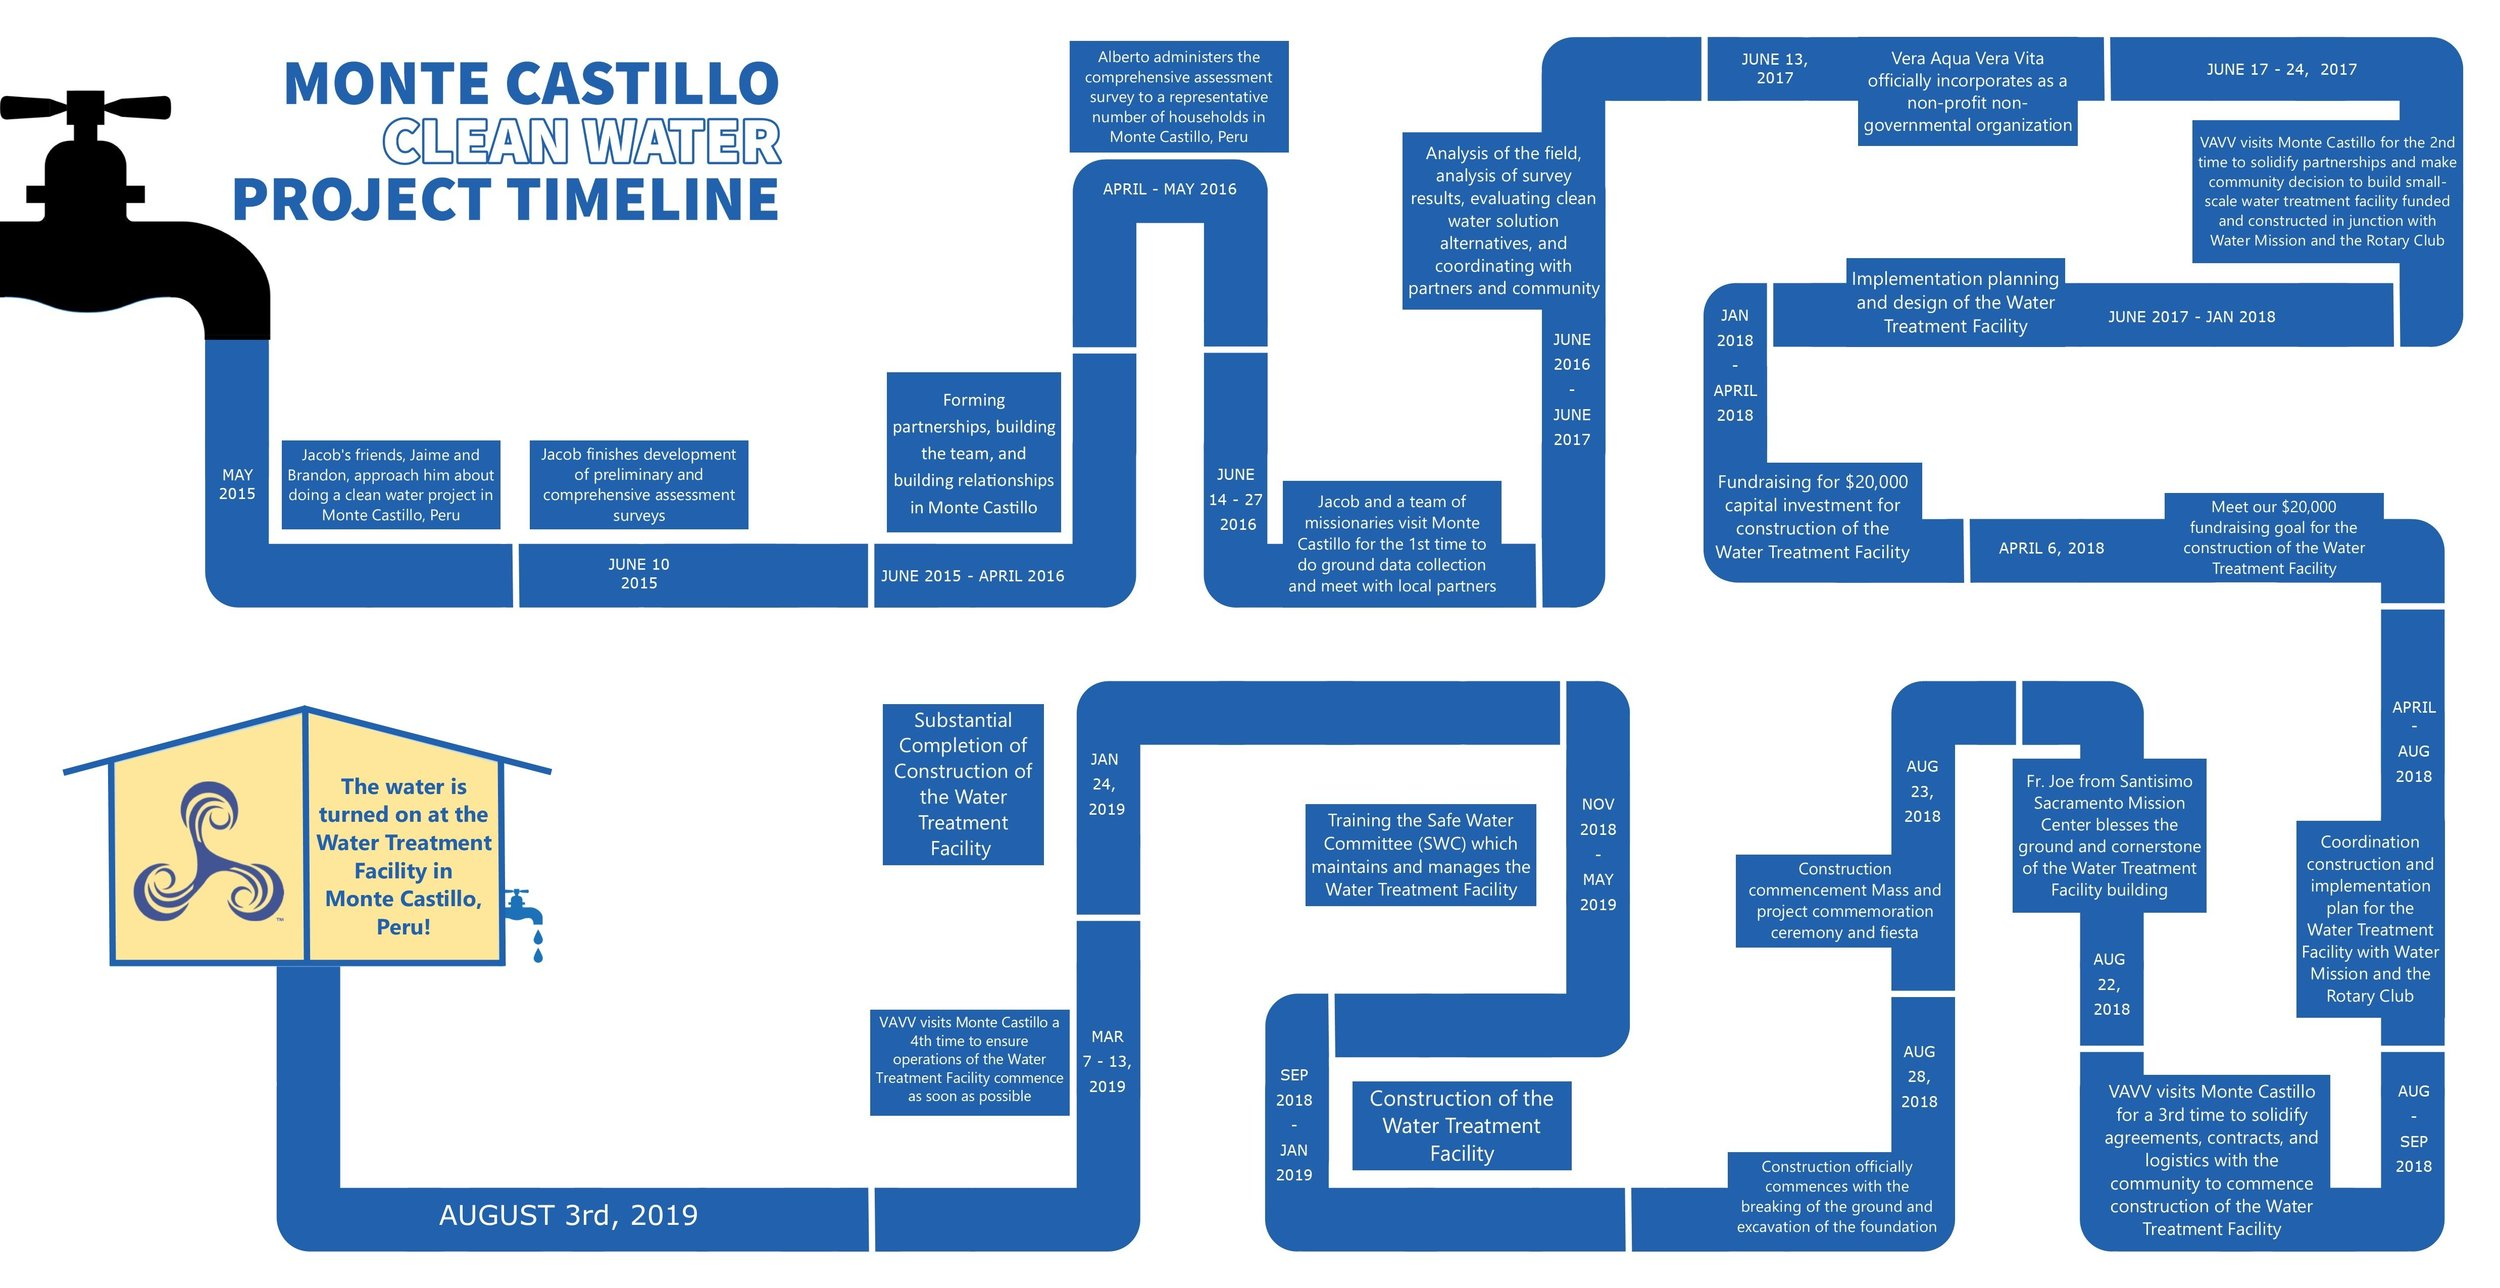 monte castillo project timeline FINAL.jpg